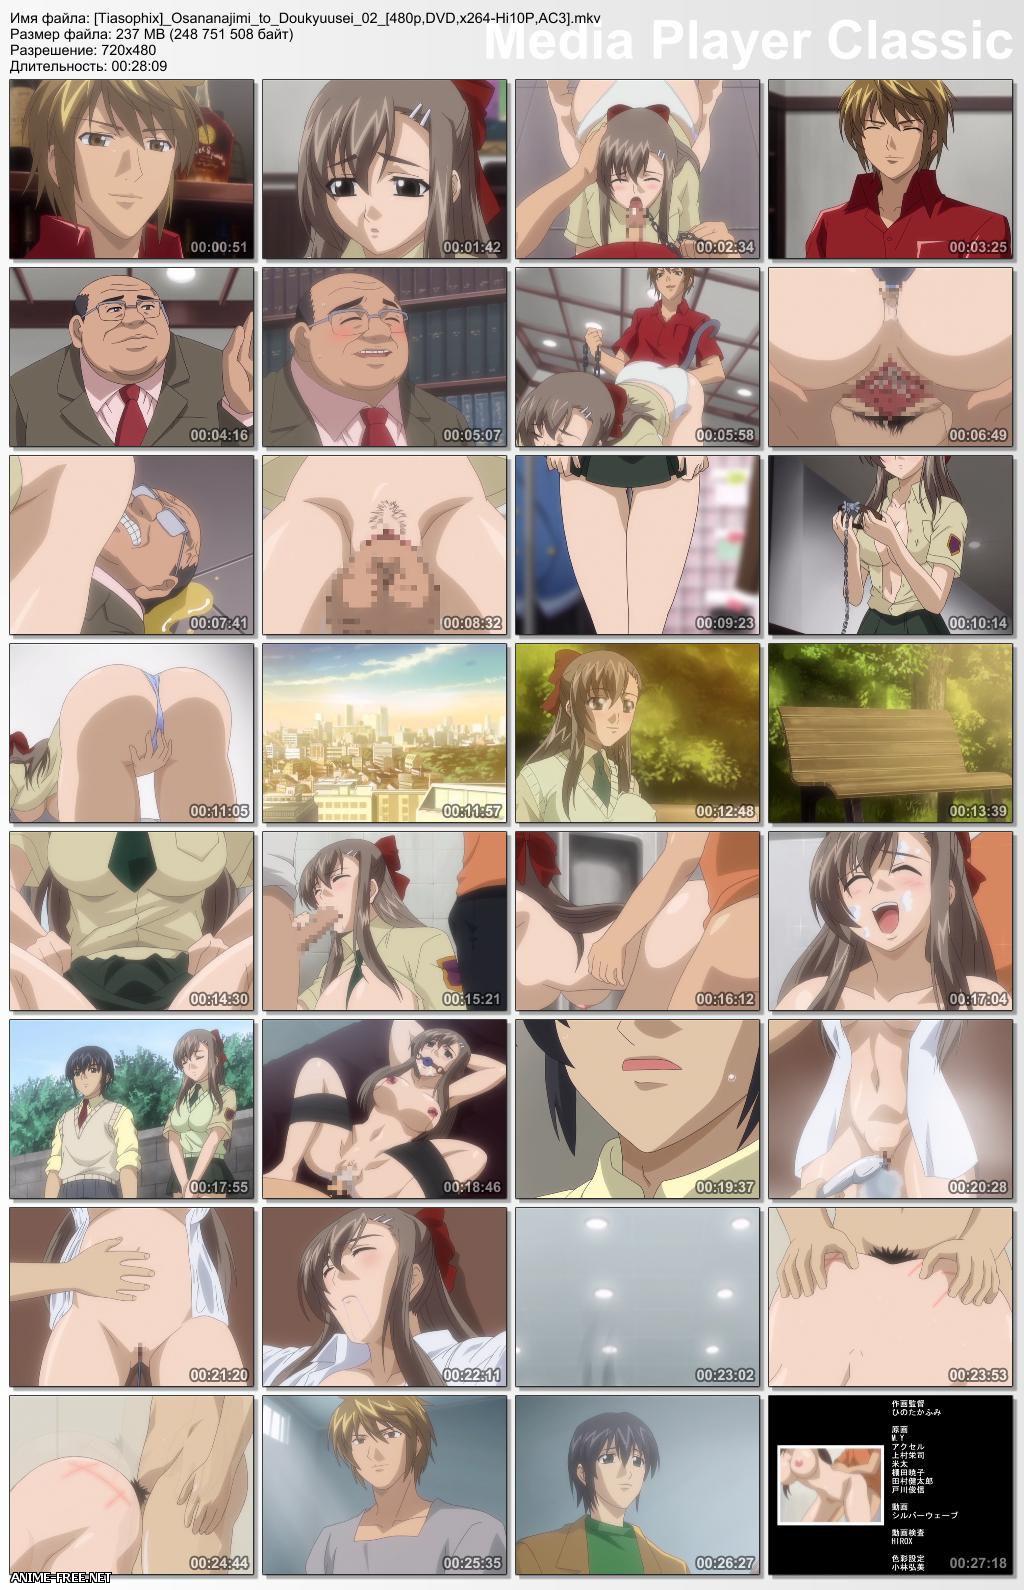 Osananajimi to Doukyuusei / Childhood friend and classmate / Друг детства и одноклассник [2 из 2] [JAP,ENG,RUS] Anime Hentai